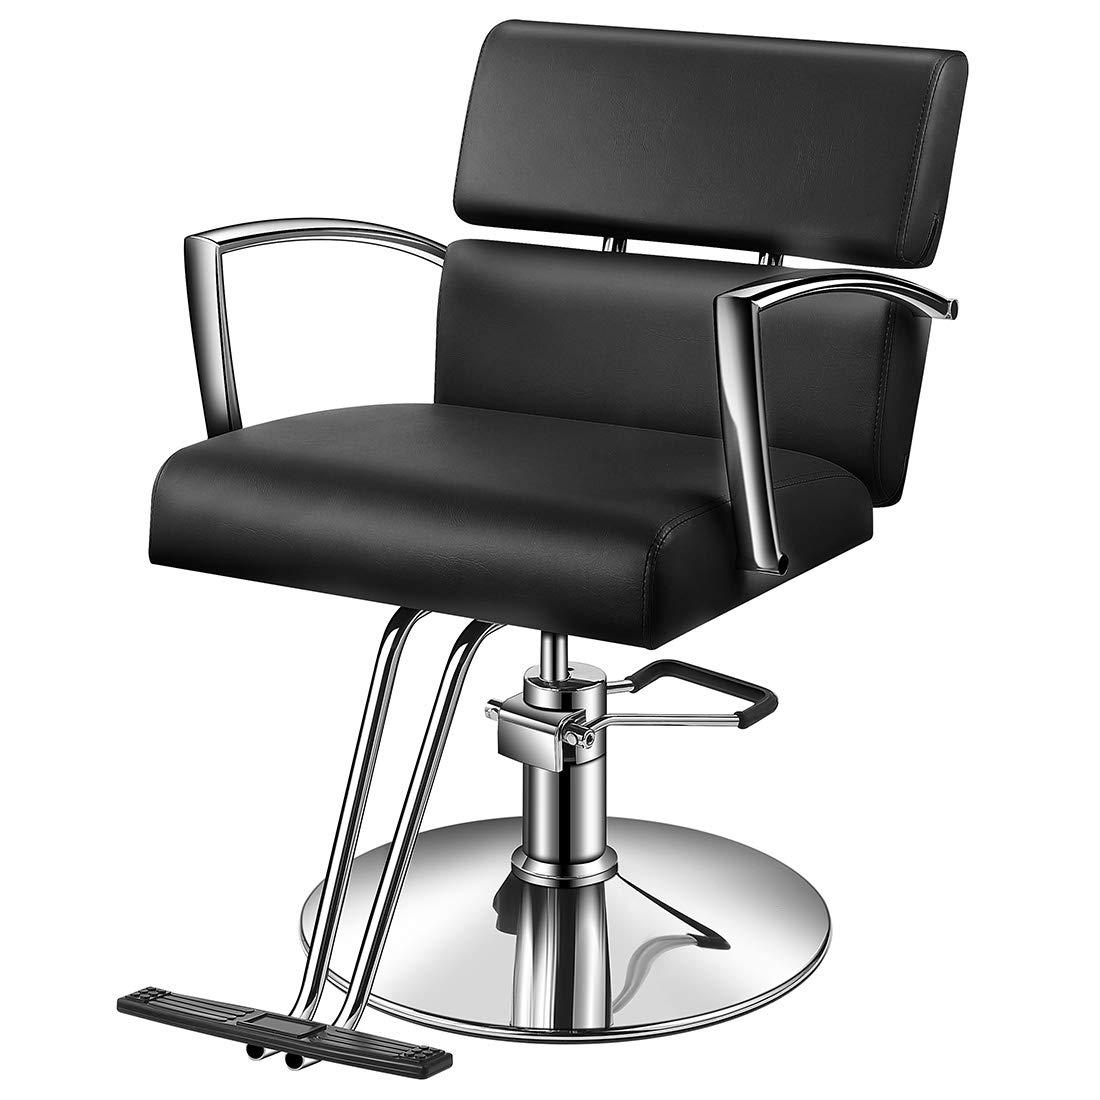 Baasha Hair Salon Chairs with Hydraulic Pump, Salon Styling Chairs, Beauty Salon Chair Black, Beauty Hydraulic Chair, Barber Salon Chair, Hair Cutting Chair, Beauty Equipment Chair Hair Salon Black by Baasha